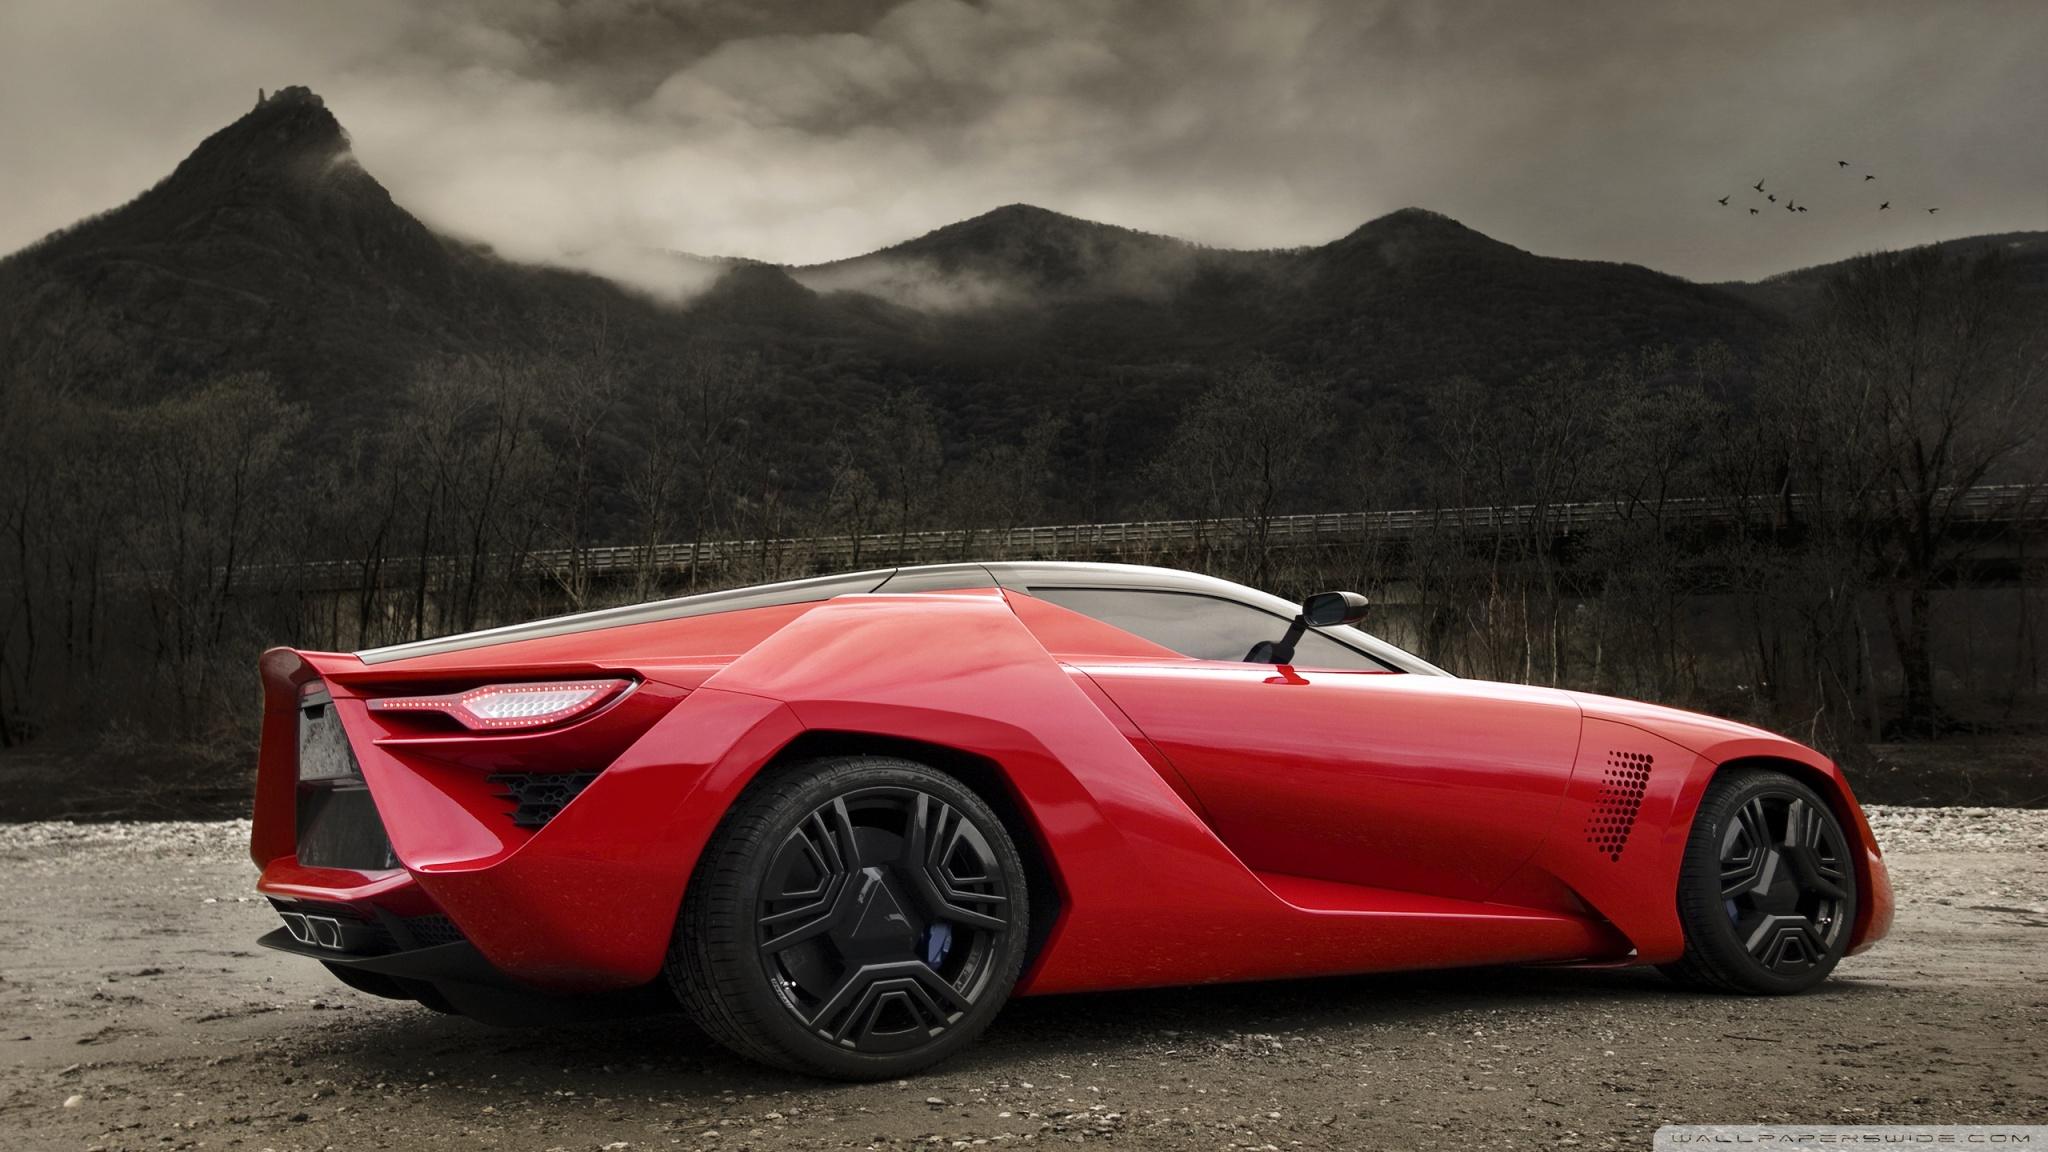 red supercar ❤ 4k hd desktop wallpaper for 4k ultra hd tv • dual